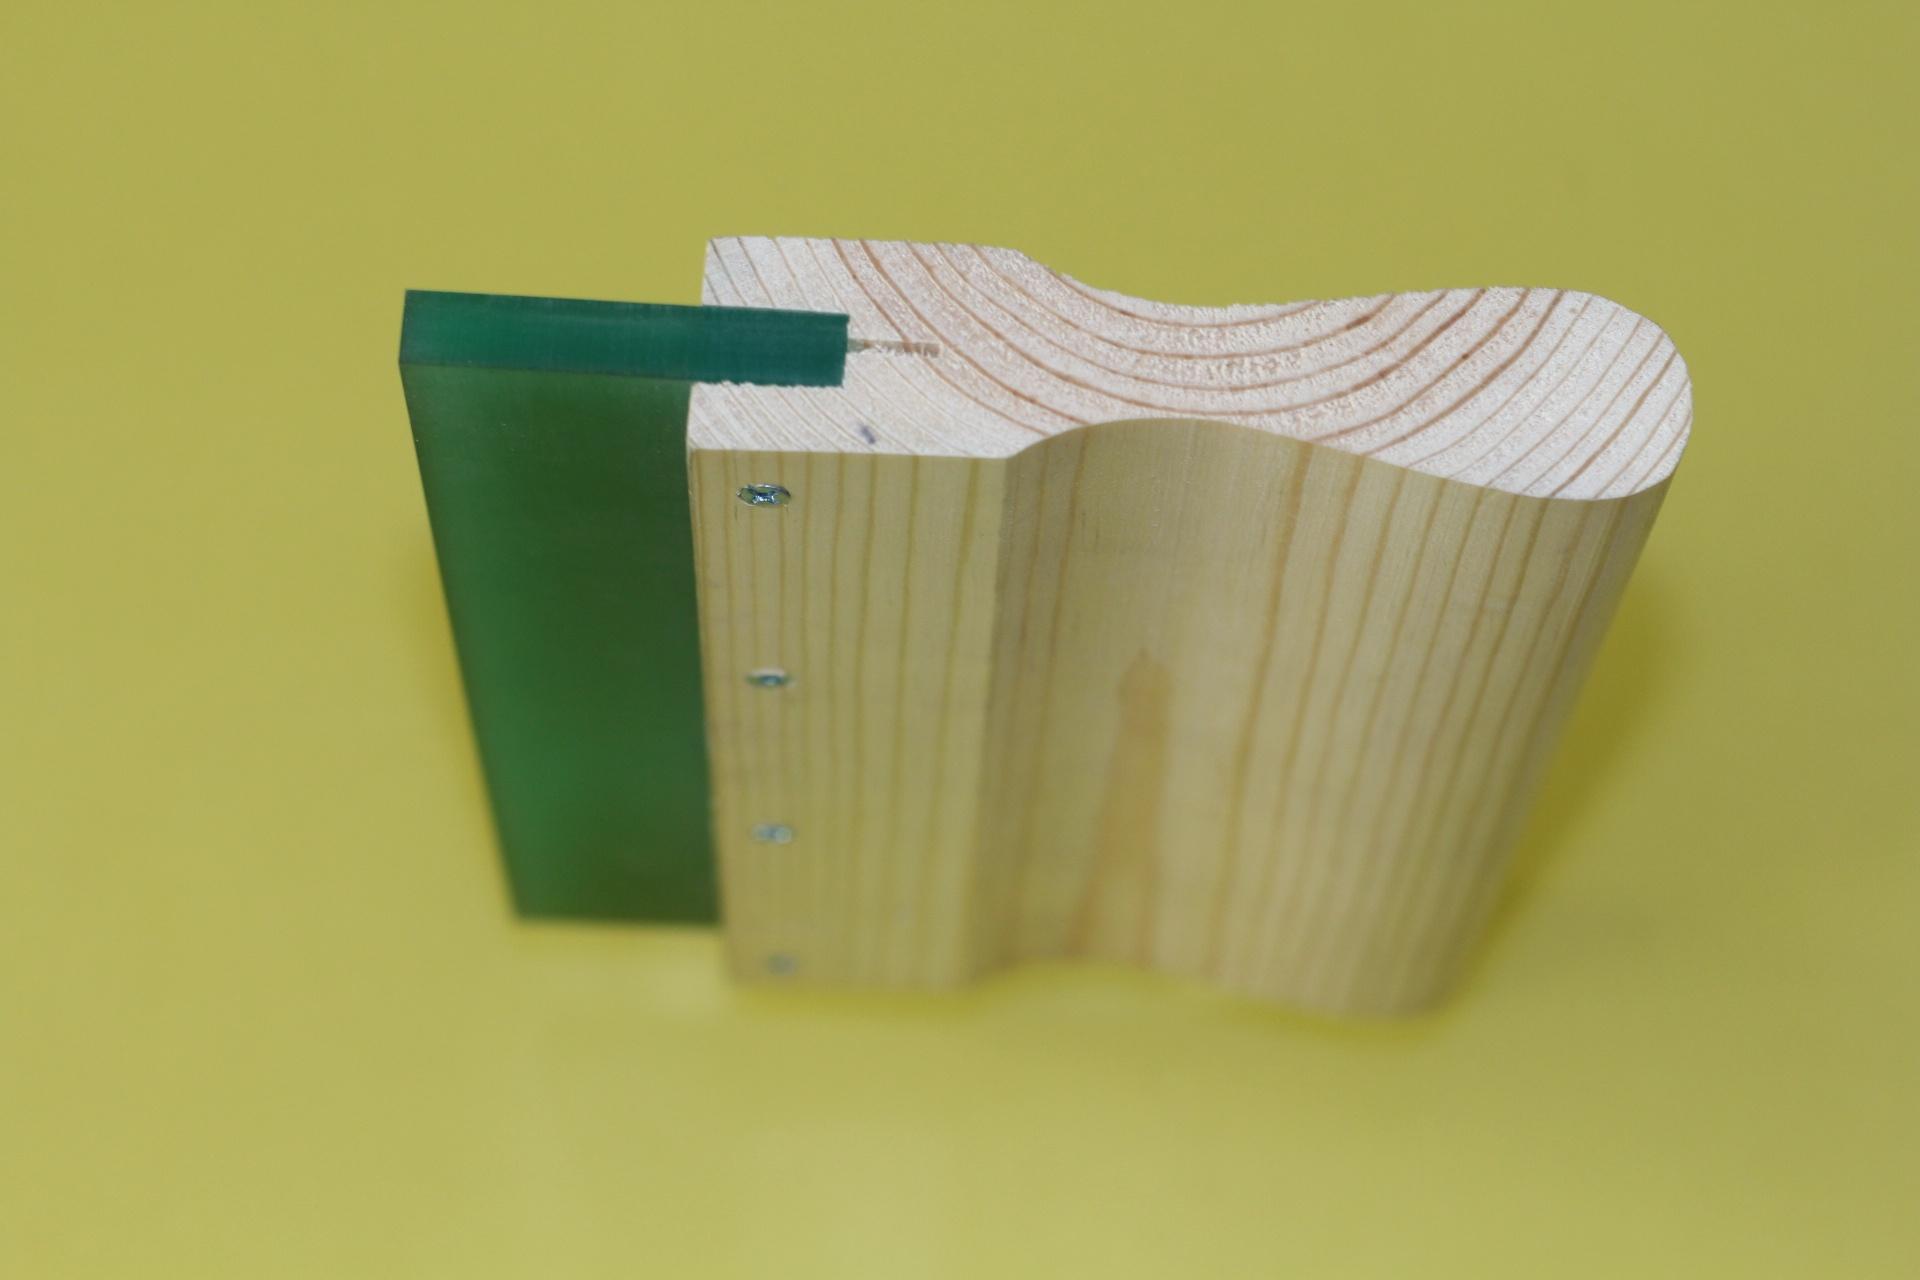 6″ Wood 70 durometer wooden handle squeegee blade -4PC